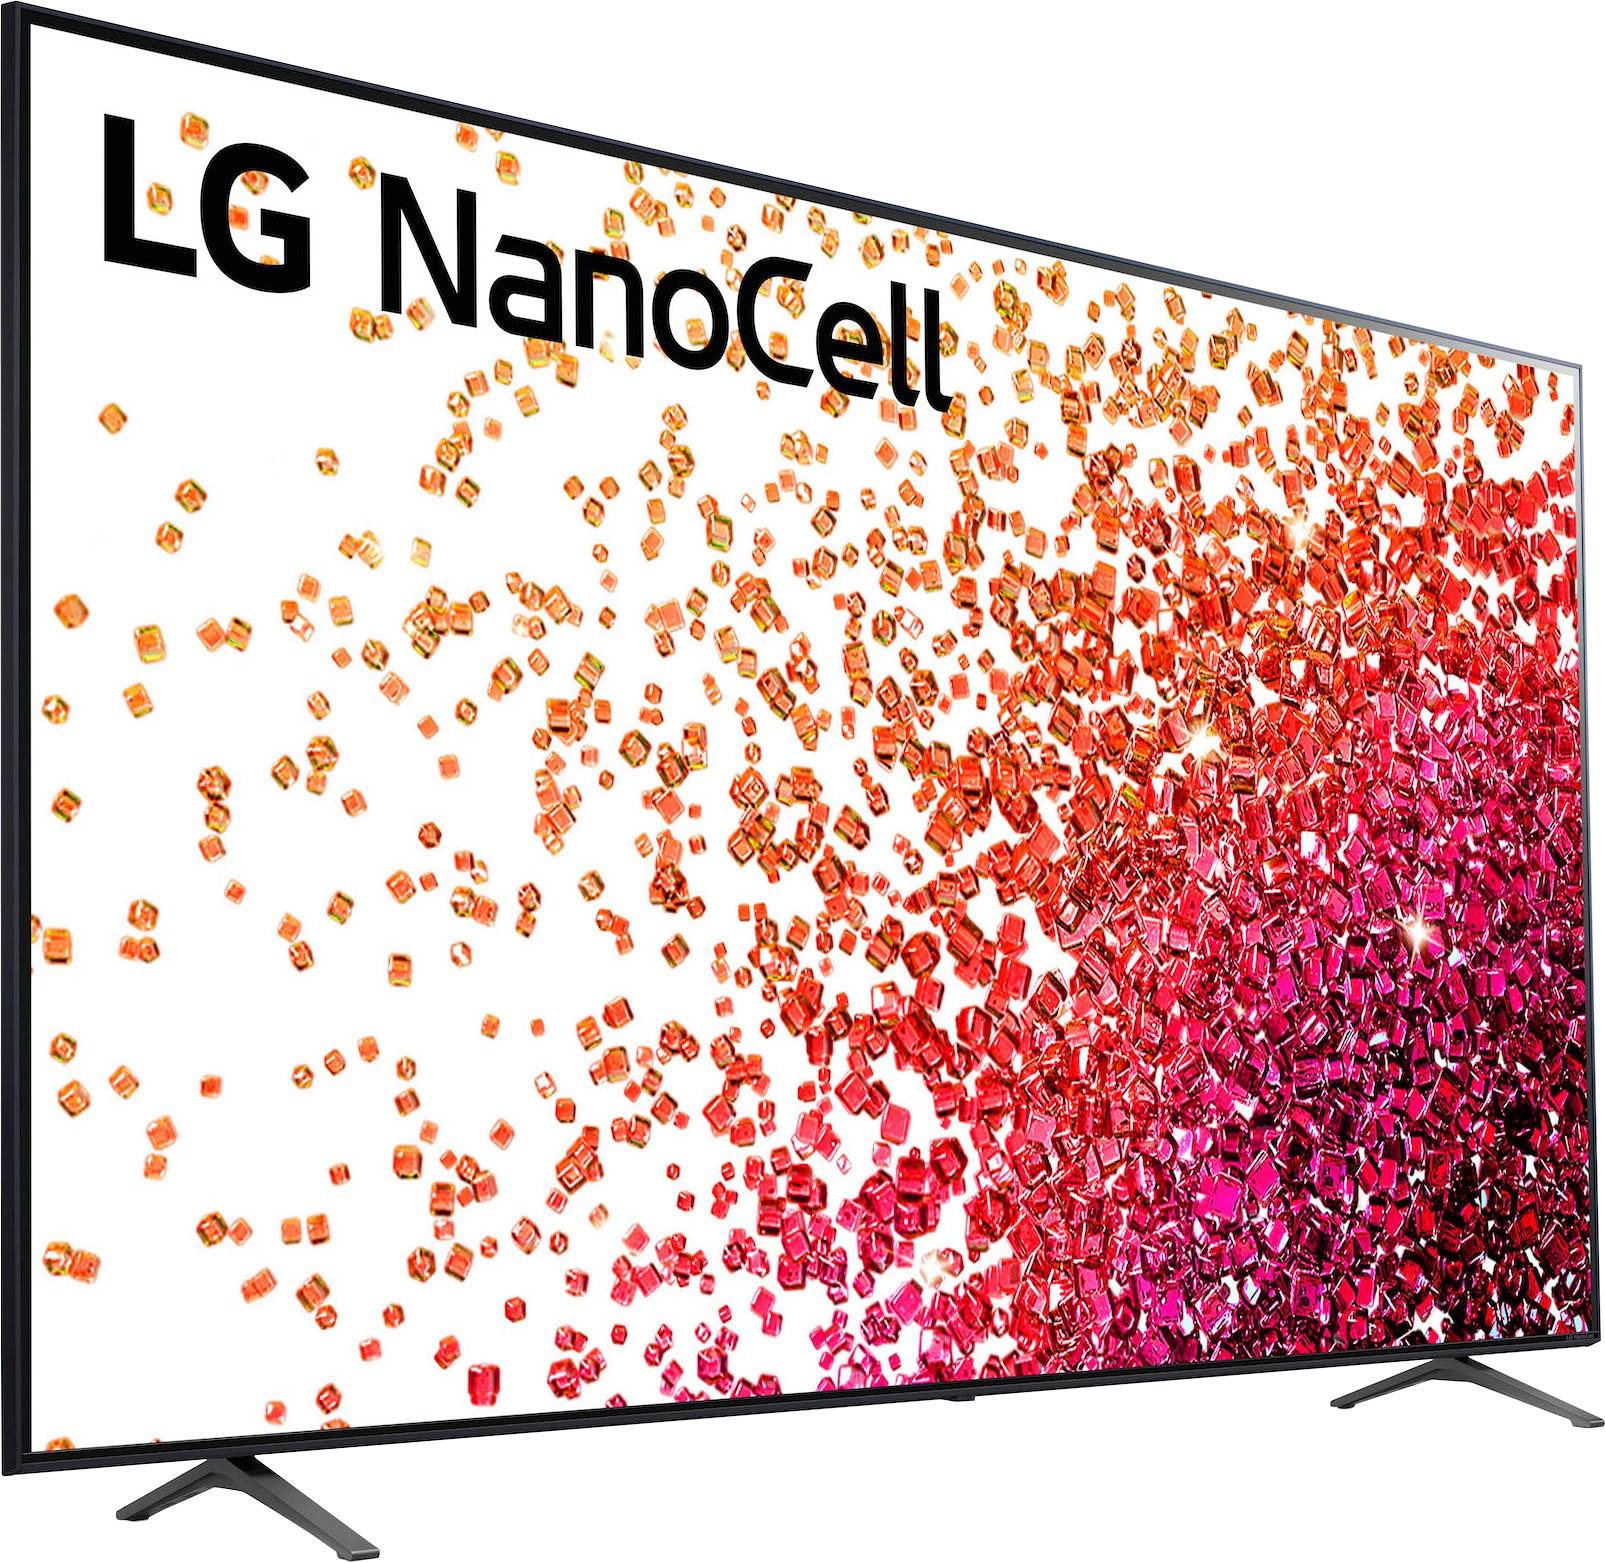 LG LCD-LED Fernseher 86NANO759PA , 217 cm 86 , 4K Ultra HD, Smart-TV, bis zu 120Hz -LG Local Contrast-α7 Gen4 4K AI-Prozessor-Sprachassistenten-Dolby Vision IQ -Dolby Atmos